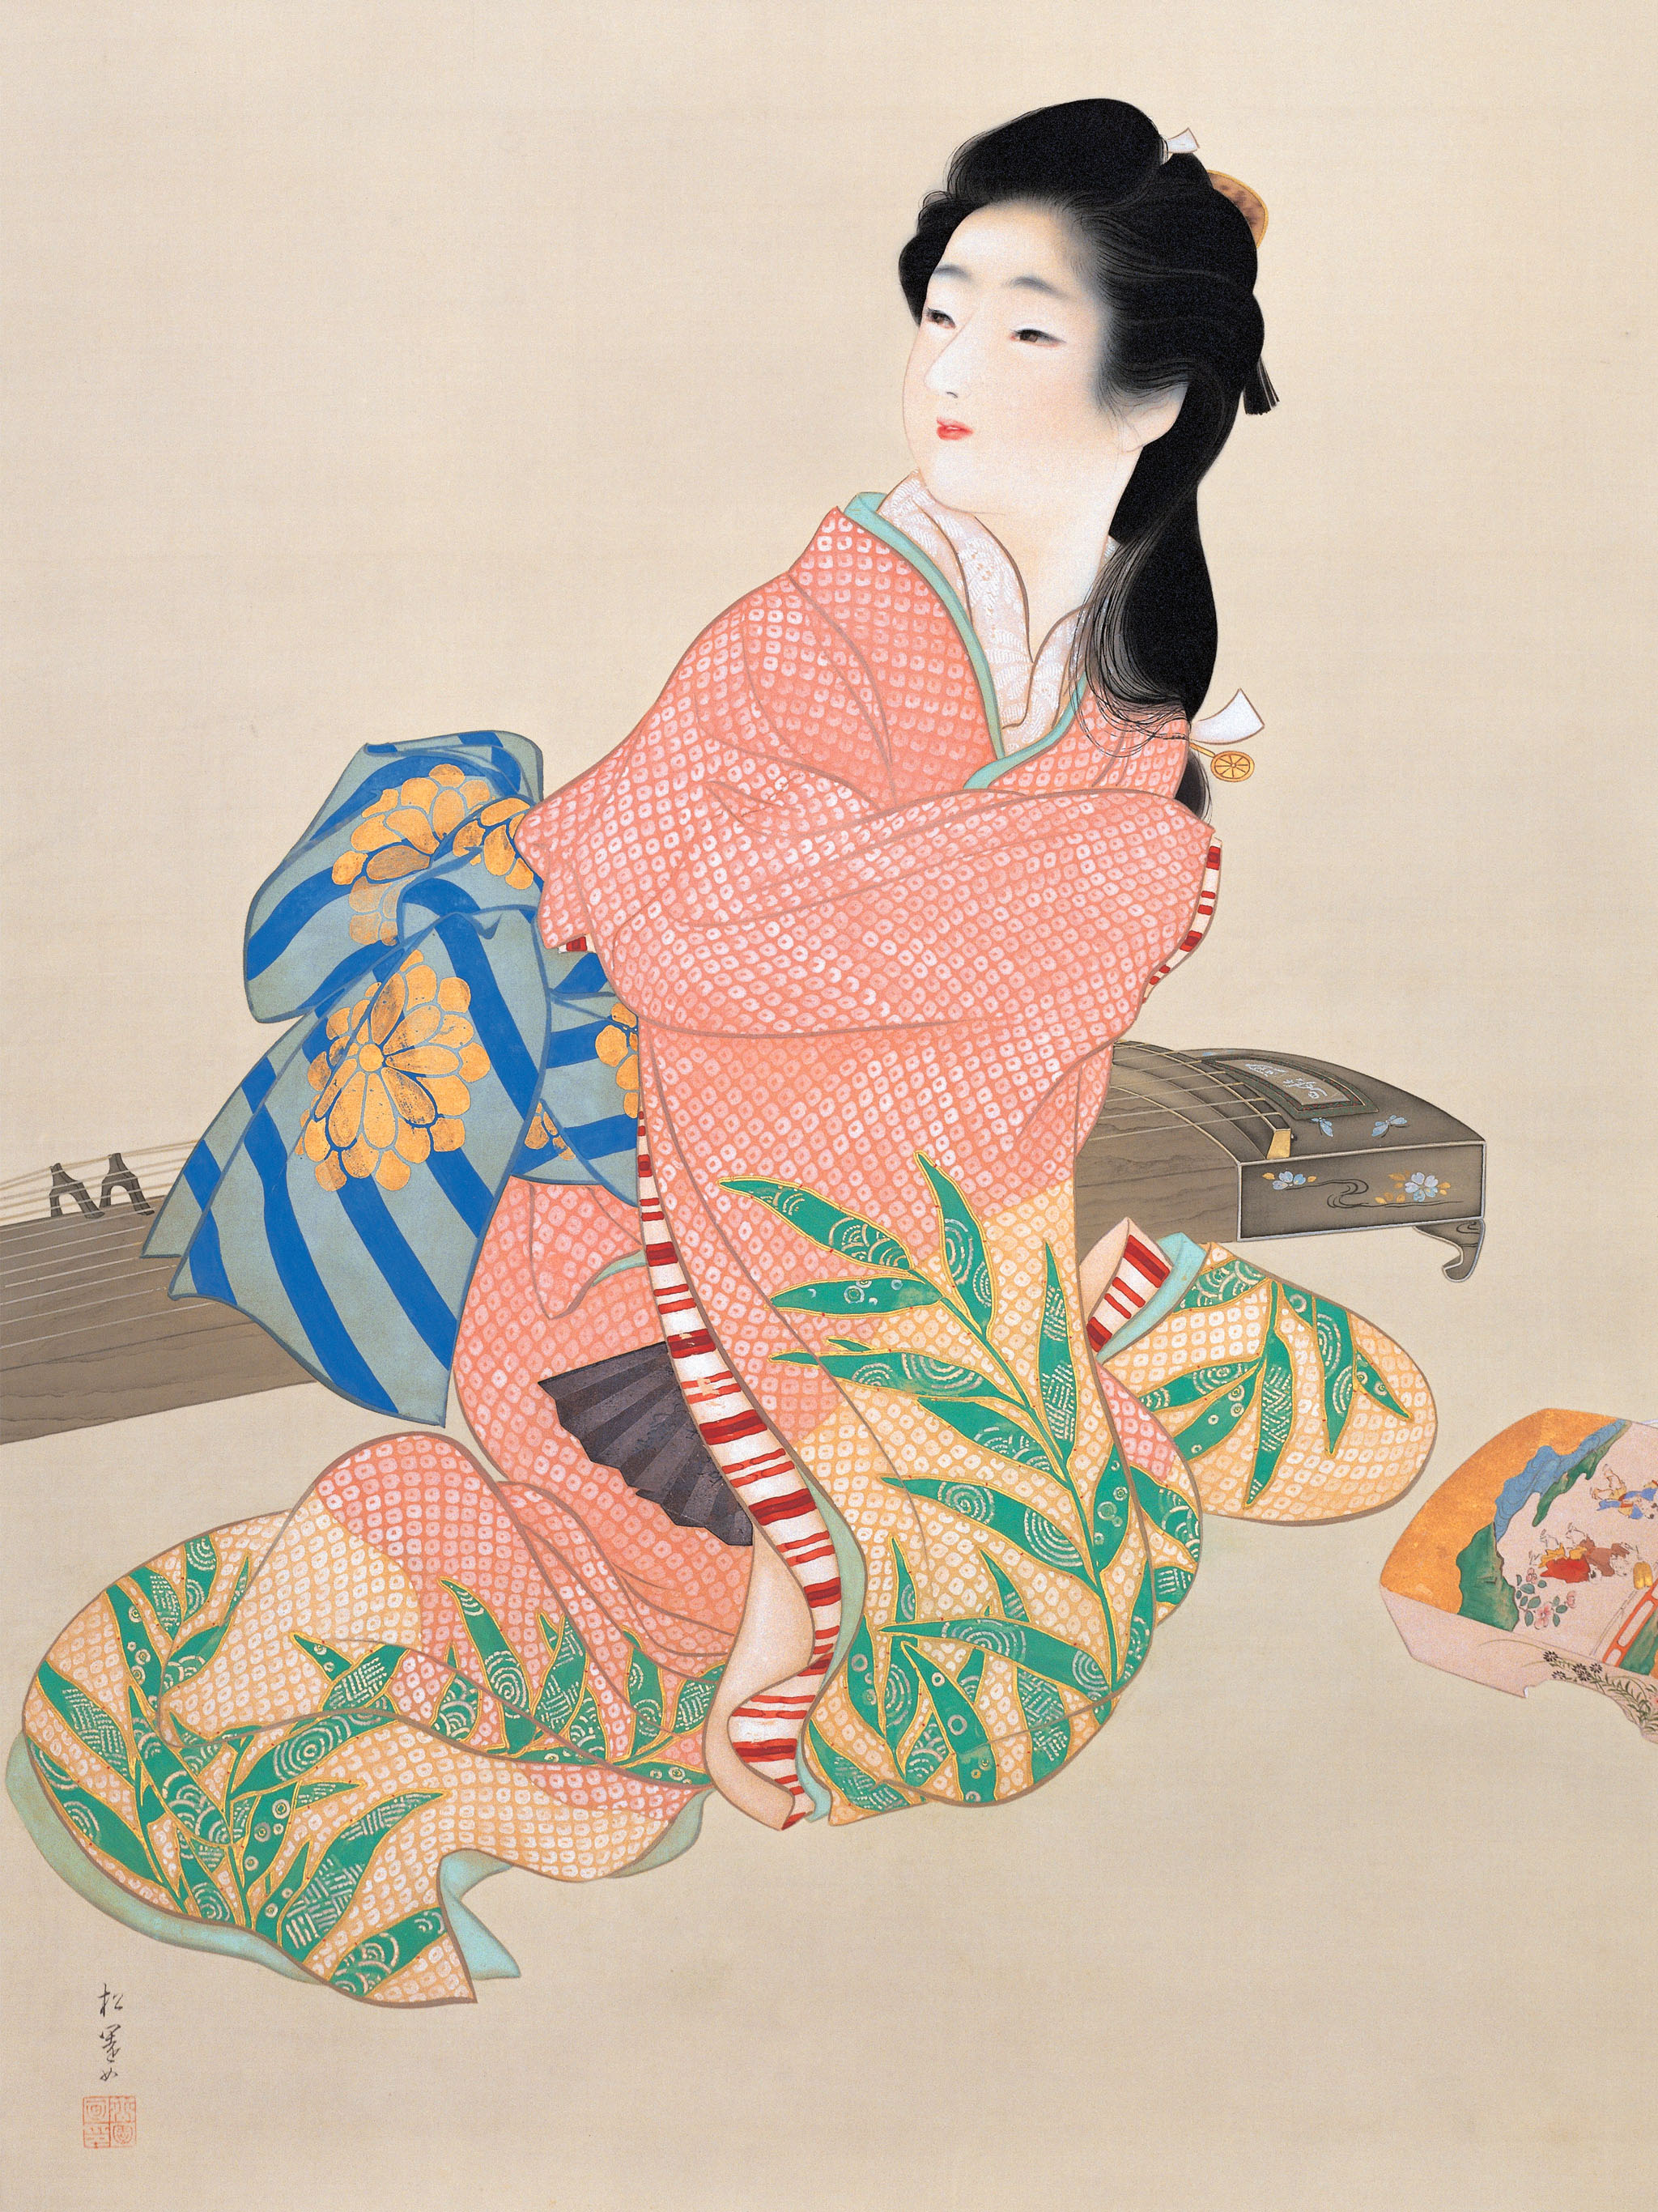 上村松園 娘深雪 Uemura shoen - Musume miyuki 2048x2732